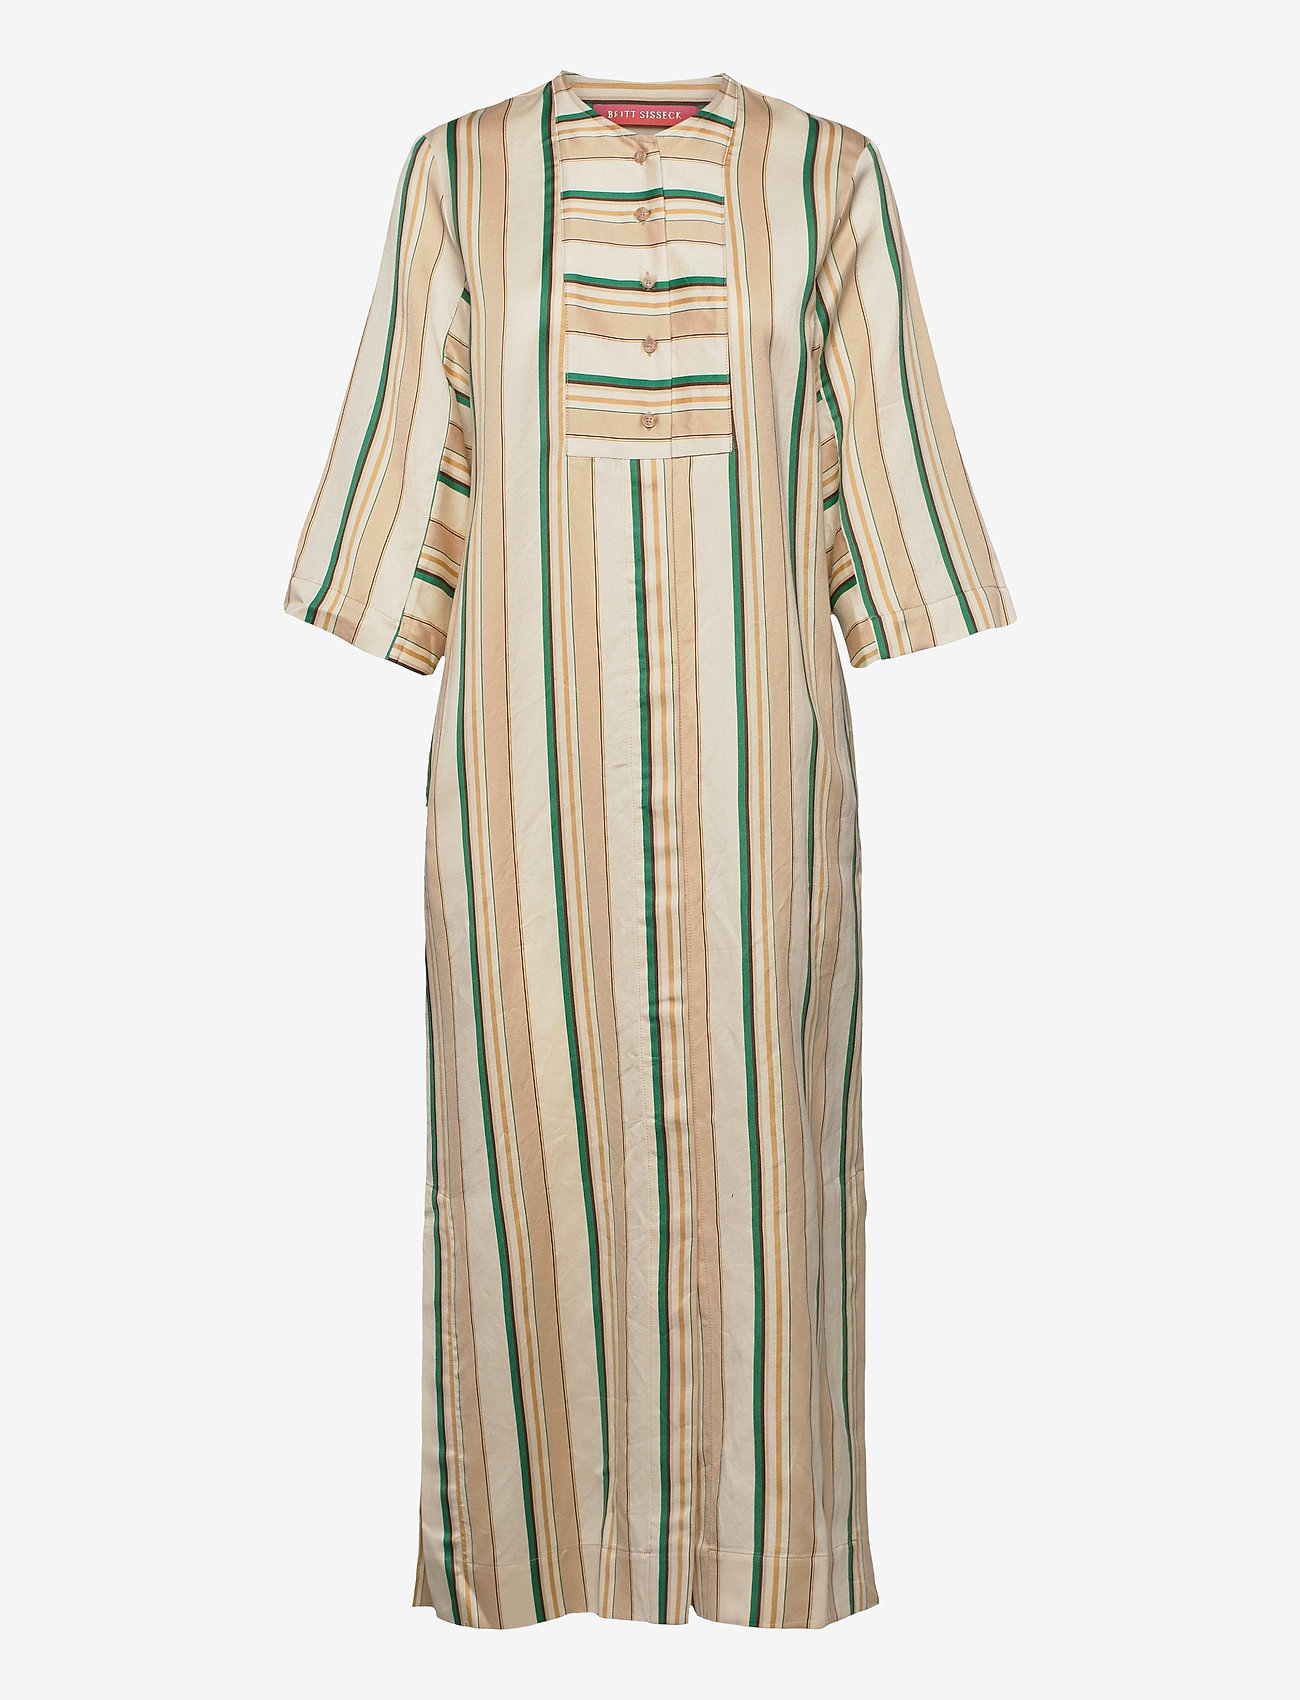 Britt Sisseck - Belle - maxi dresses - retro stripe - 1